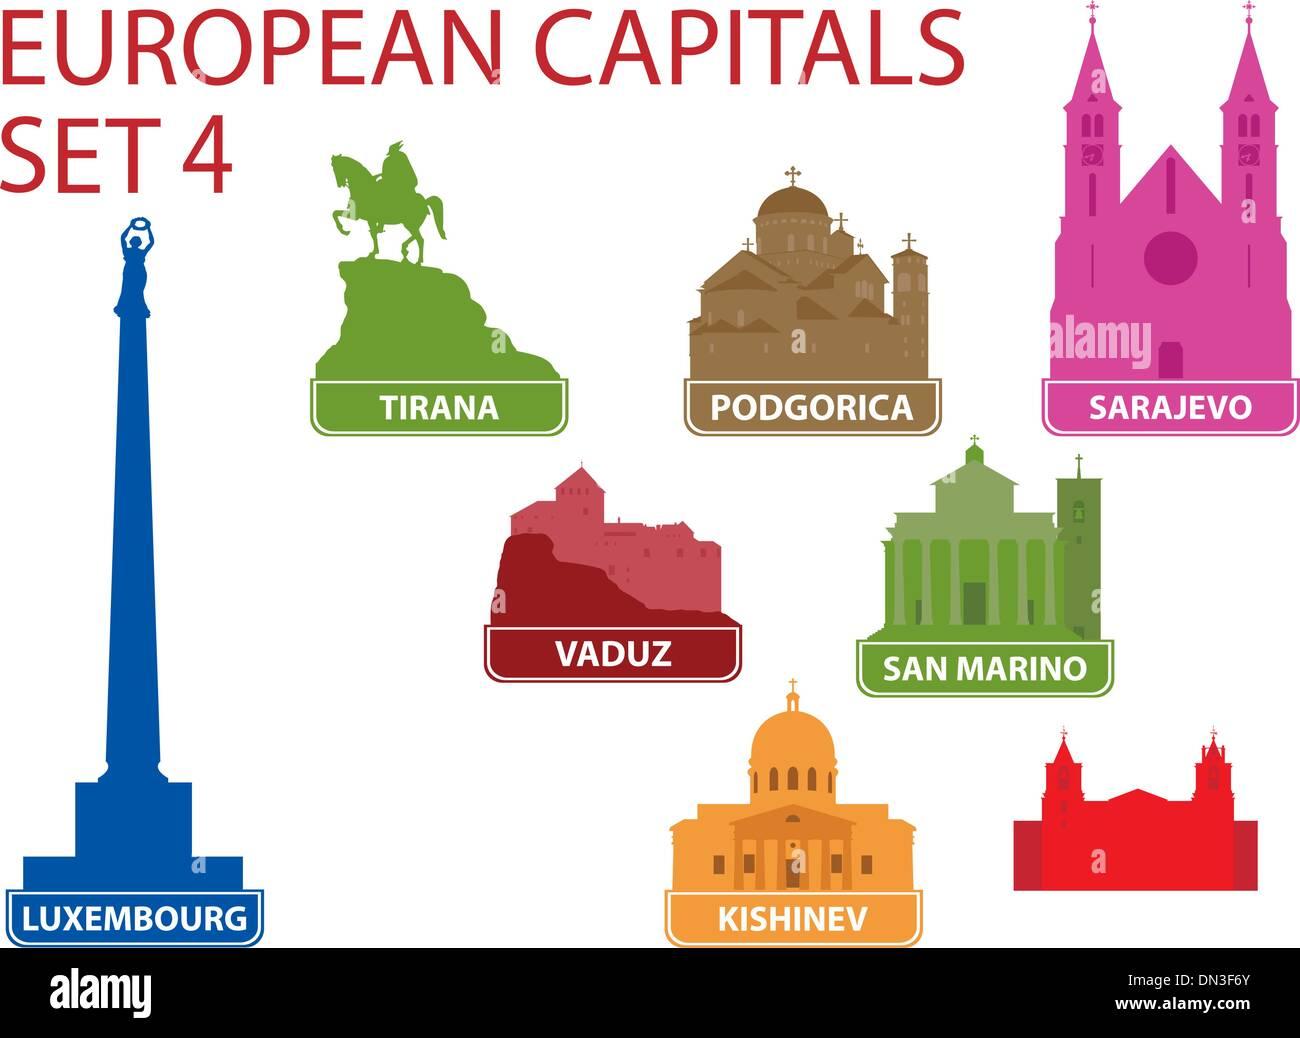 European capitals - Stock Vector